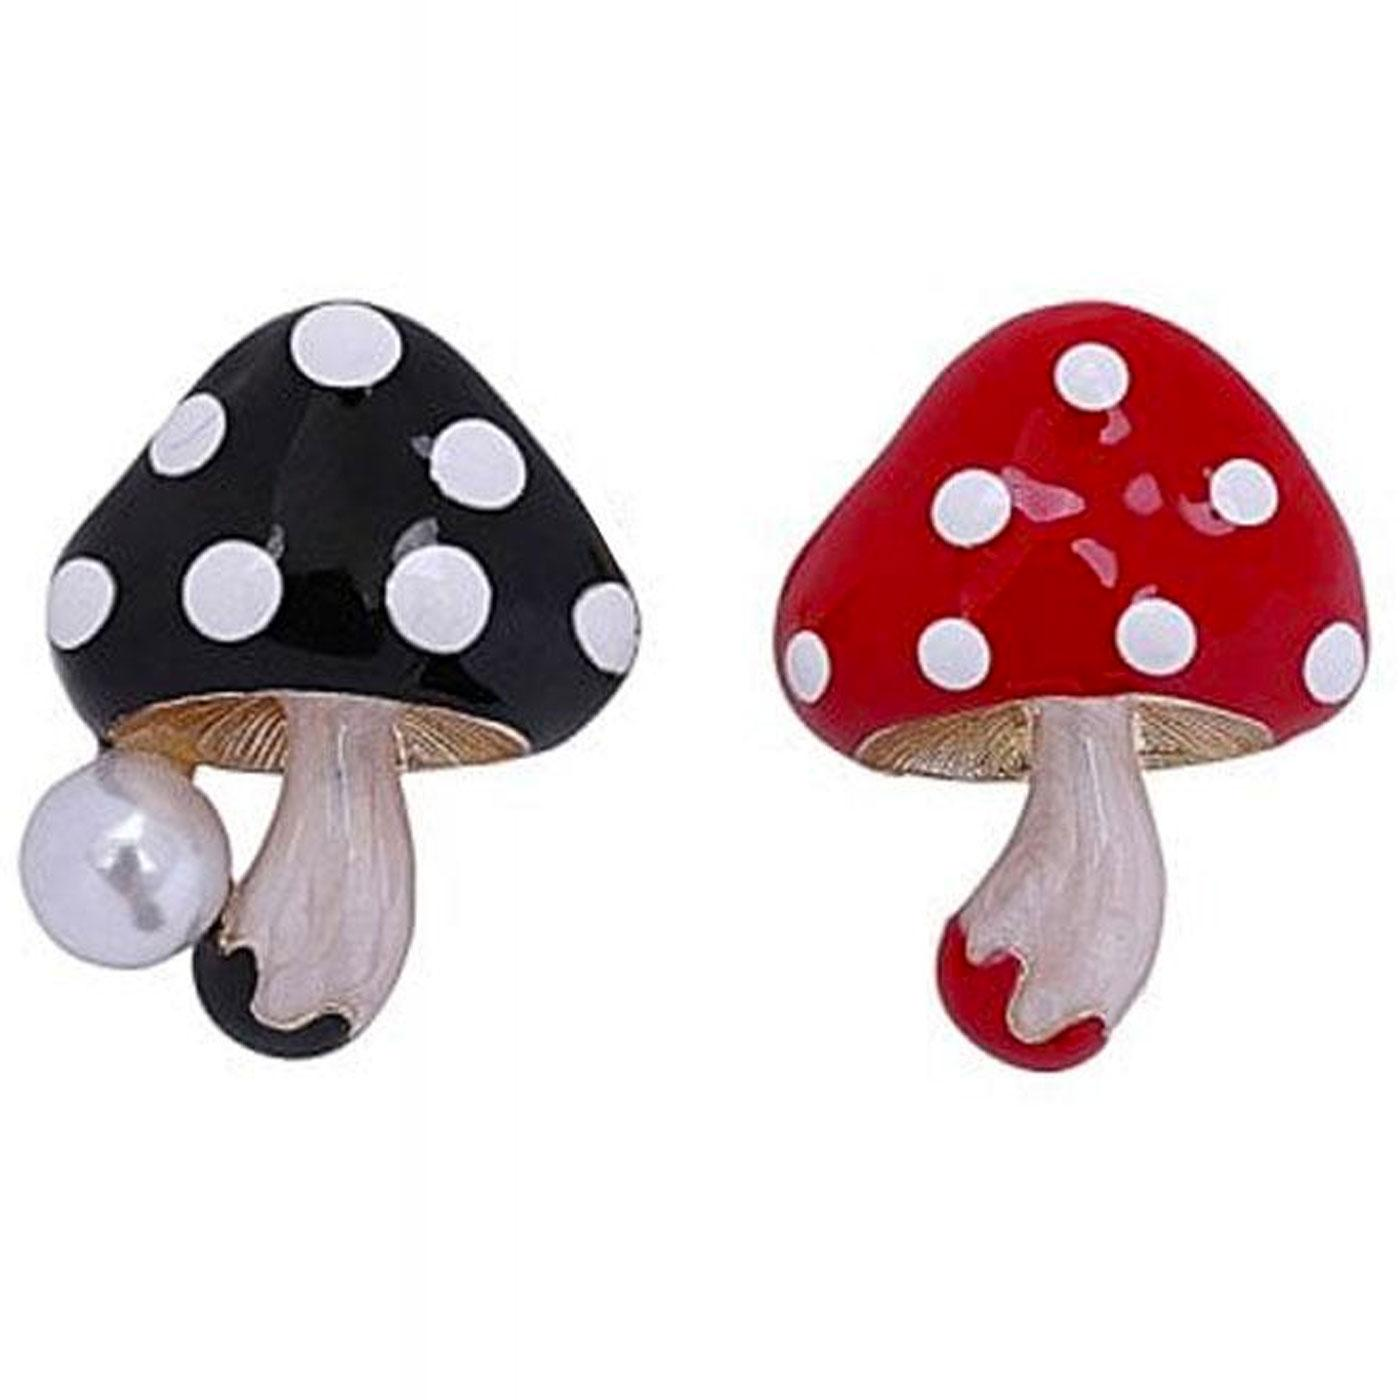 Mushies COLLECTIF Mushroom Brooch Set Red/Black